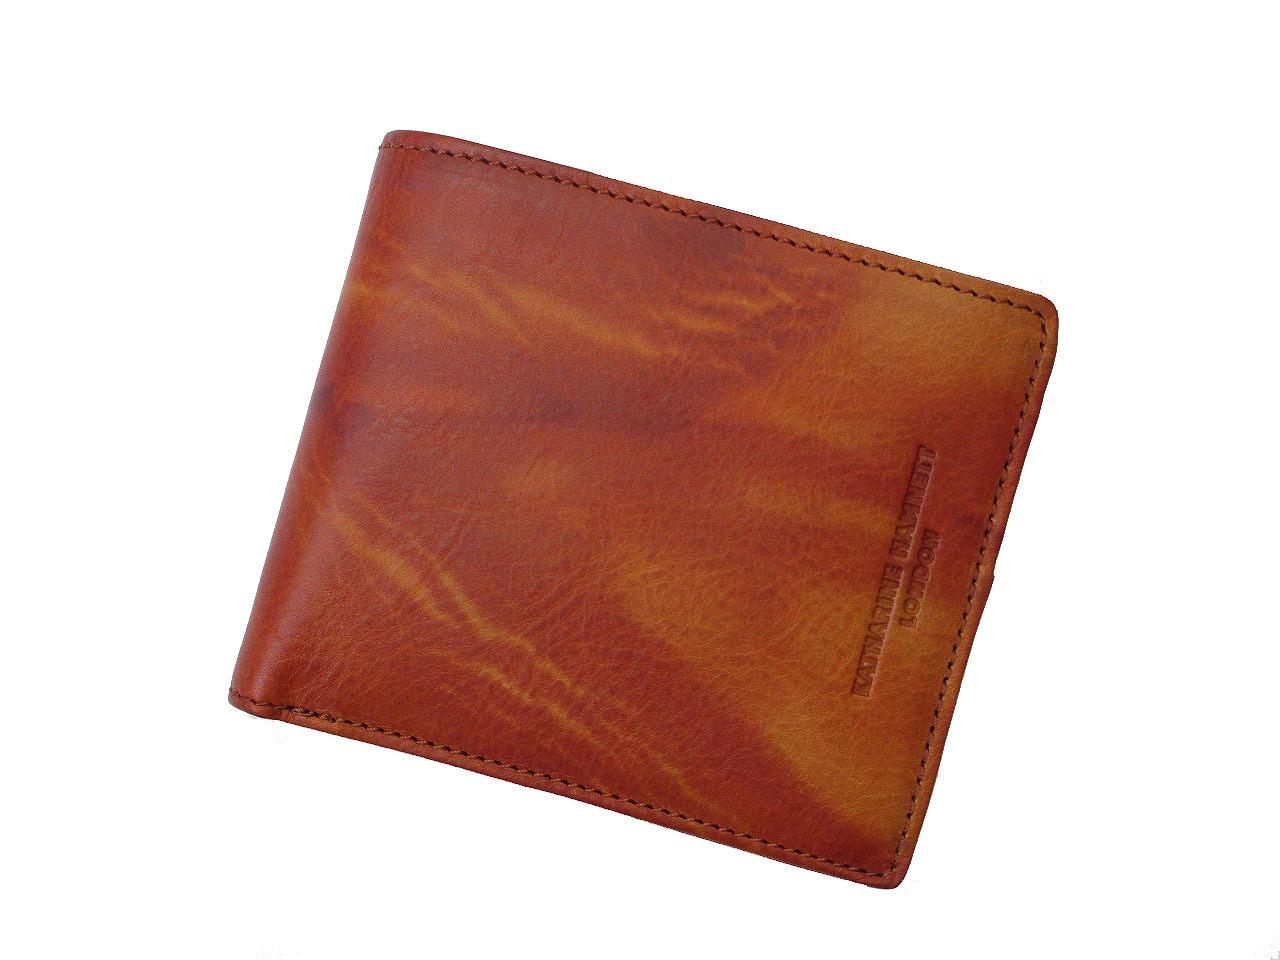 KATHARINE HAMNETT キャサリンハムネット FLUID メンズ 二つ折り財布(小銭入れあり) 59200